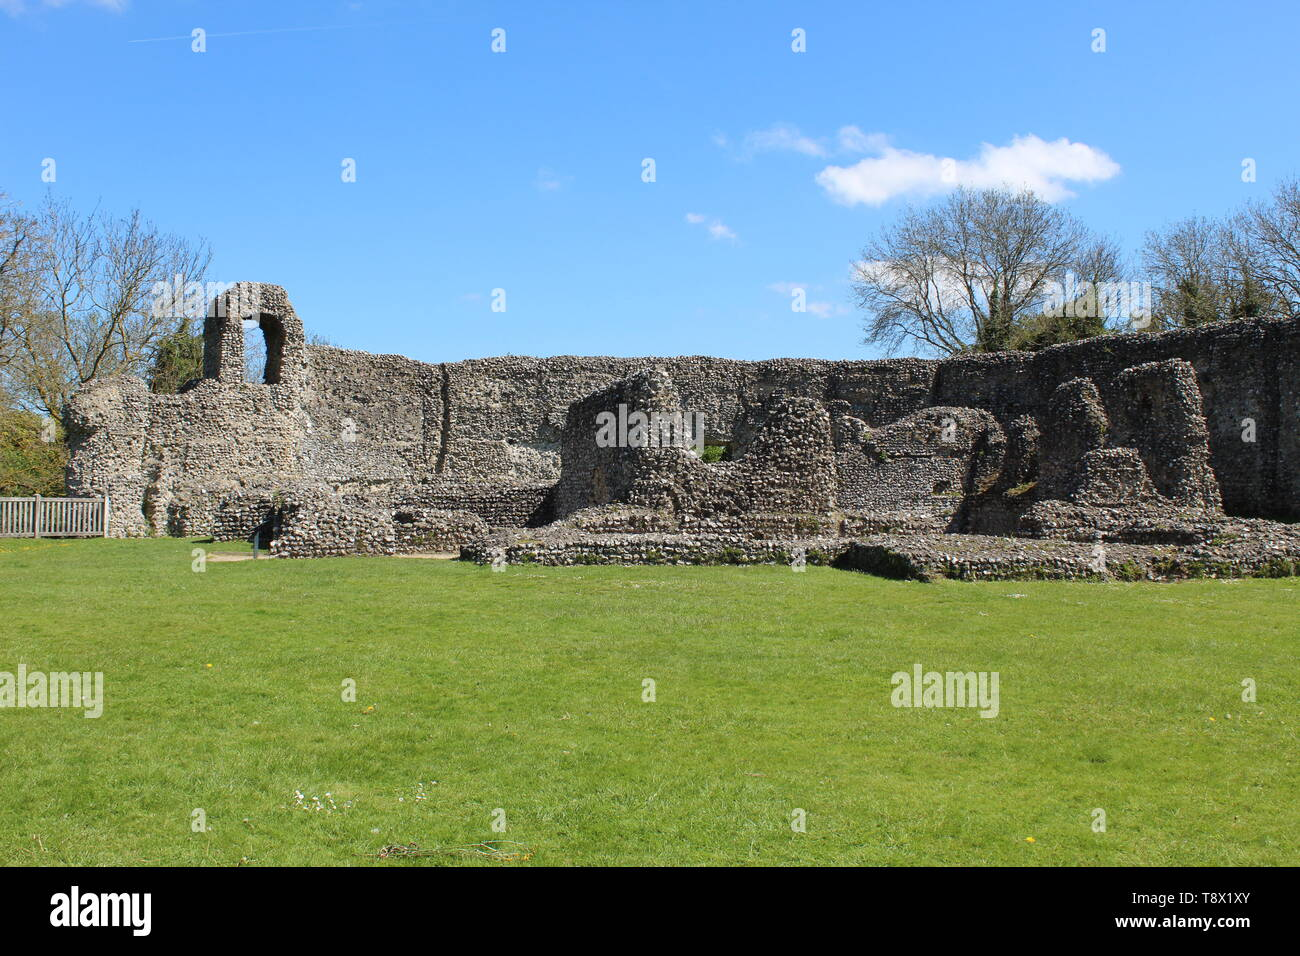 Eynsford castle #9 - Stock Image